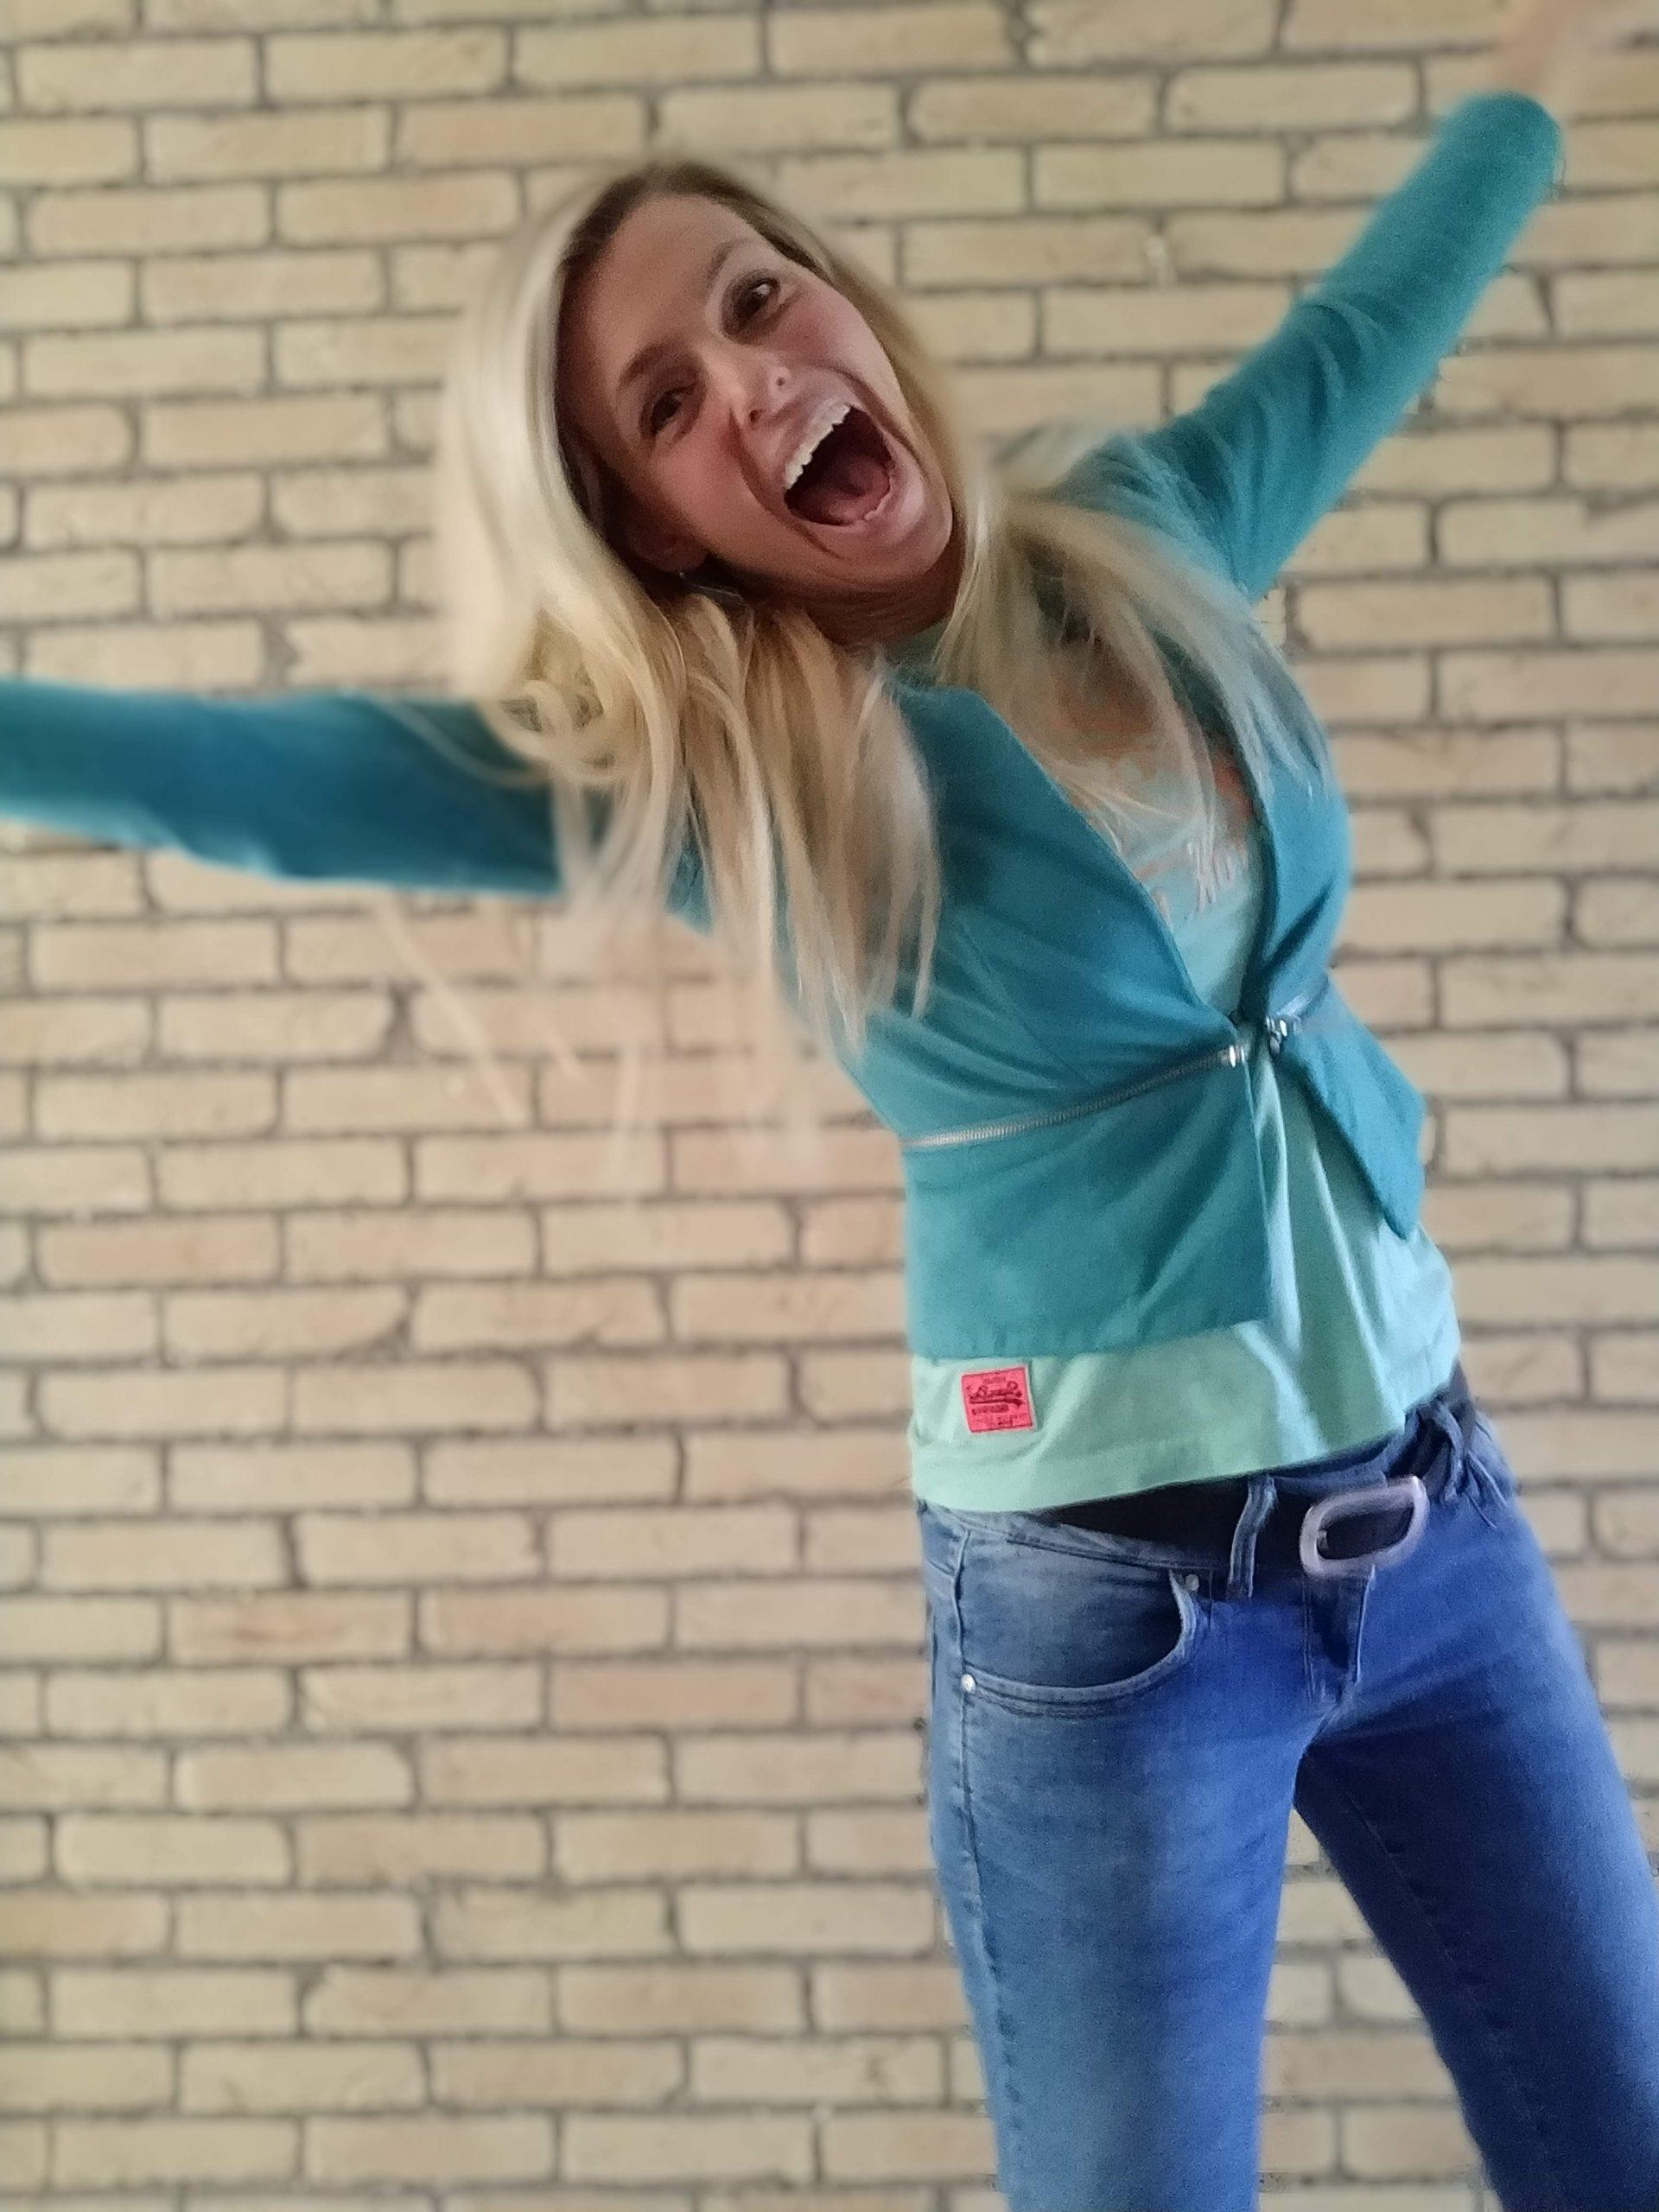 Wendy springt stress uit lichaam